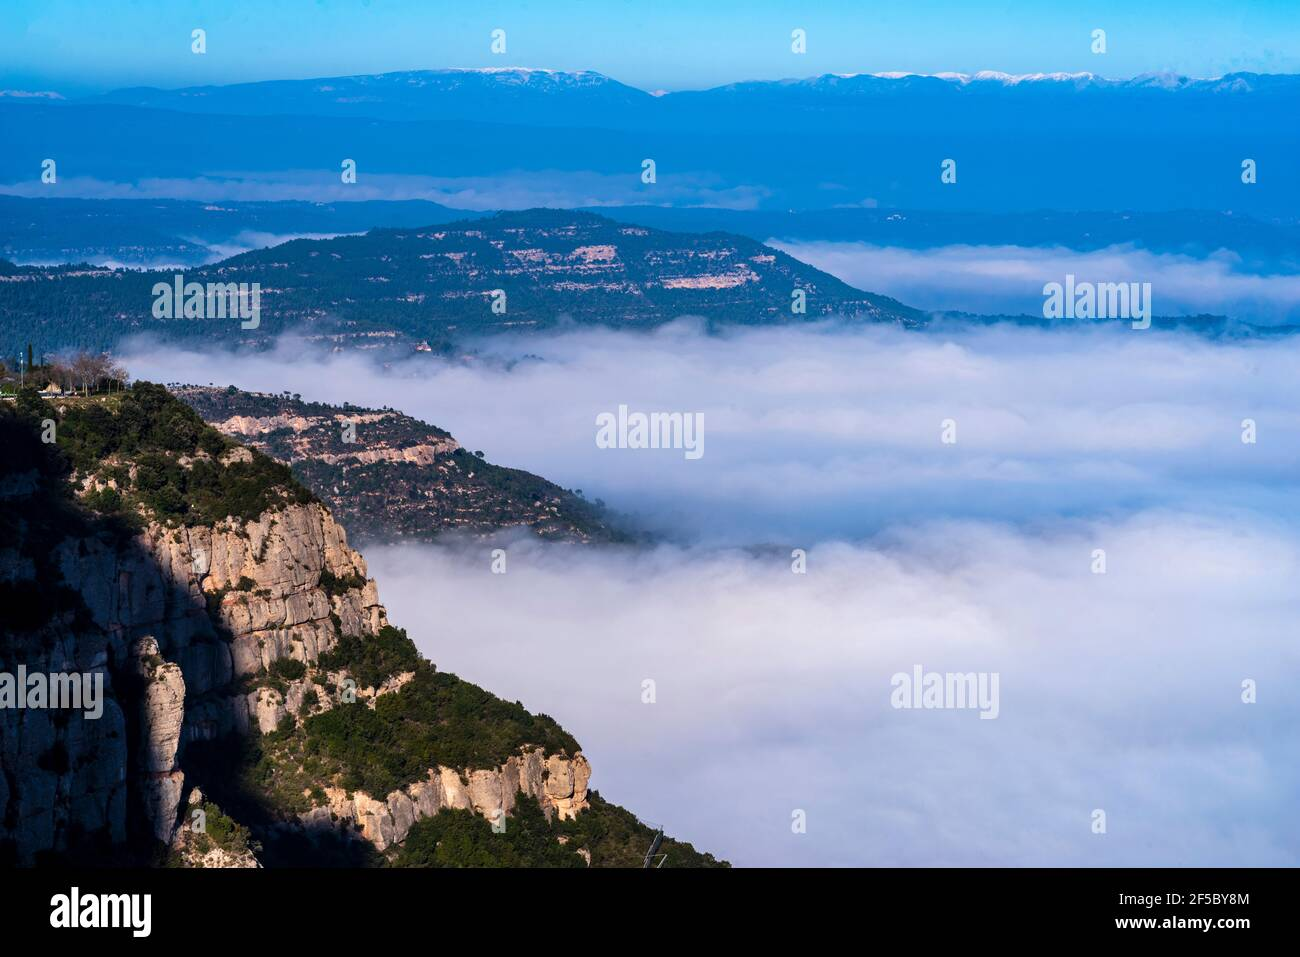 Mountain and basilica of Montserrat, Aerial view of central Catalonia, Manresa area, Barcelona, Catalonia, Spain. Stock Photo